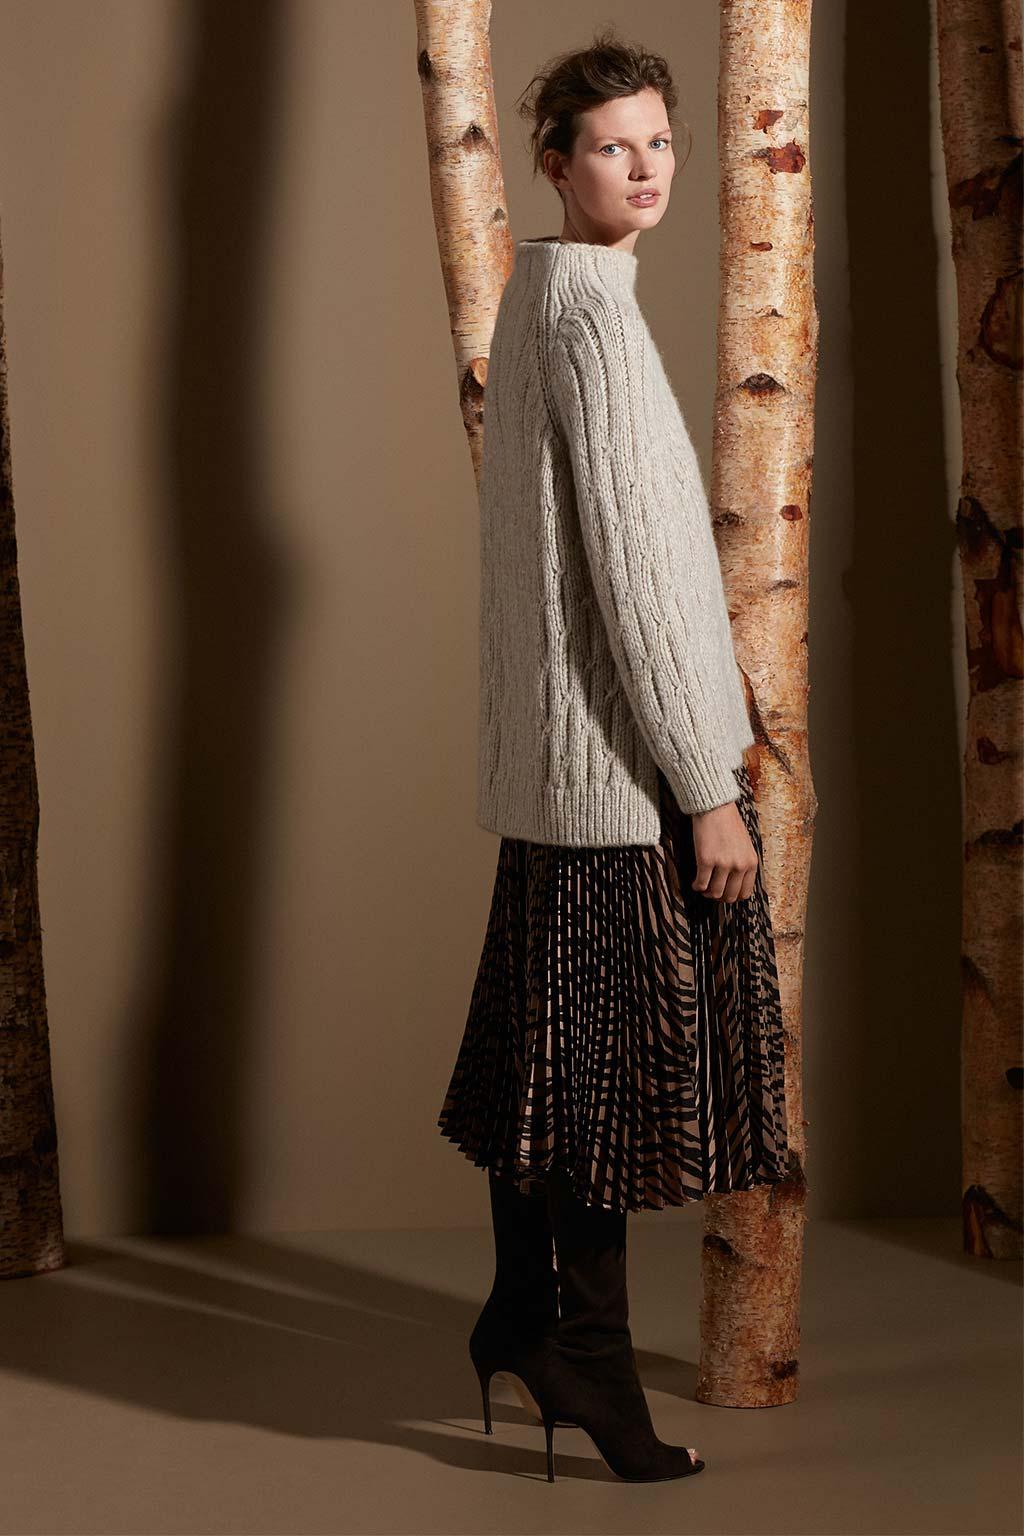 CH Carolina Herrera. New womenswear collection Spotlight. Look 10